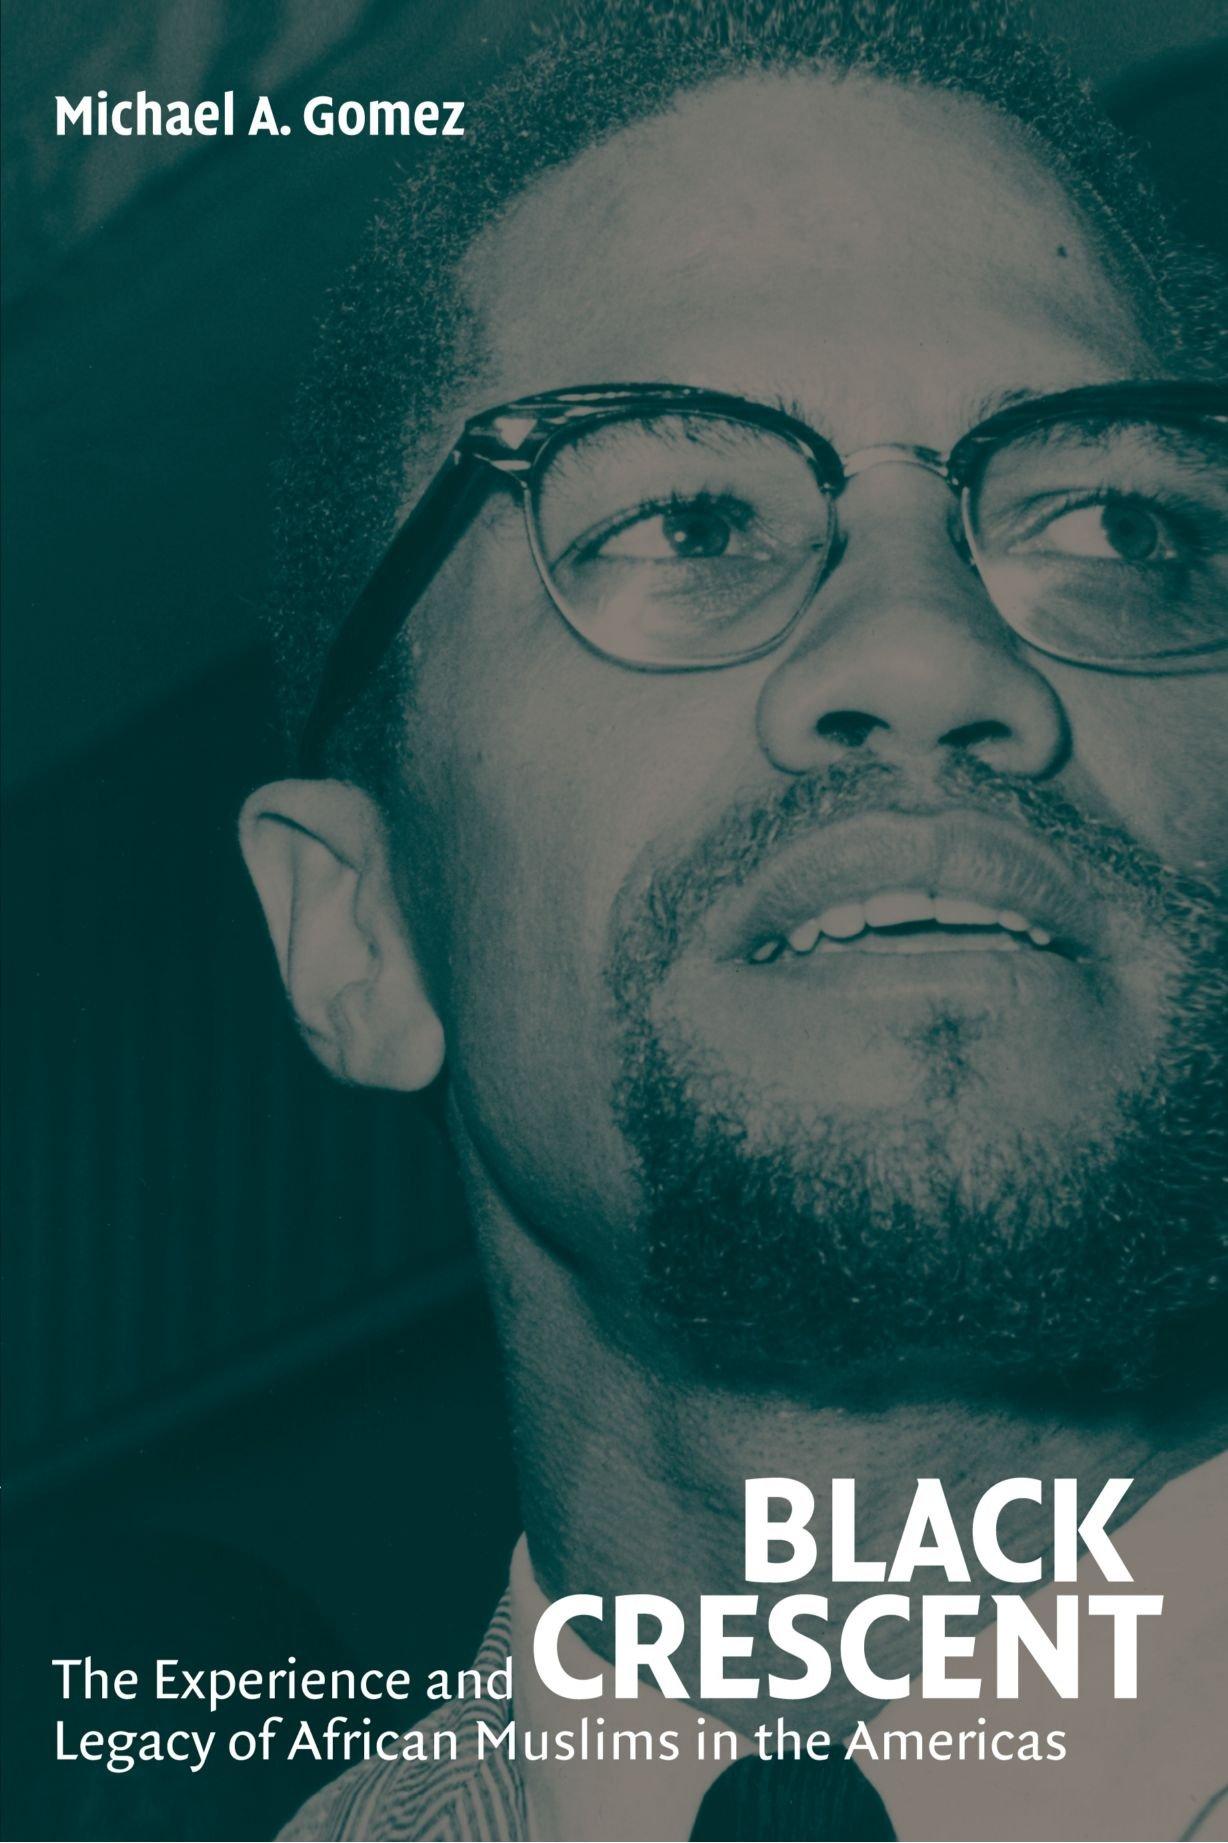 Картинки по запросу Michael A. Gomez black crescent